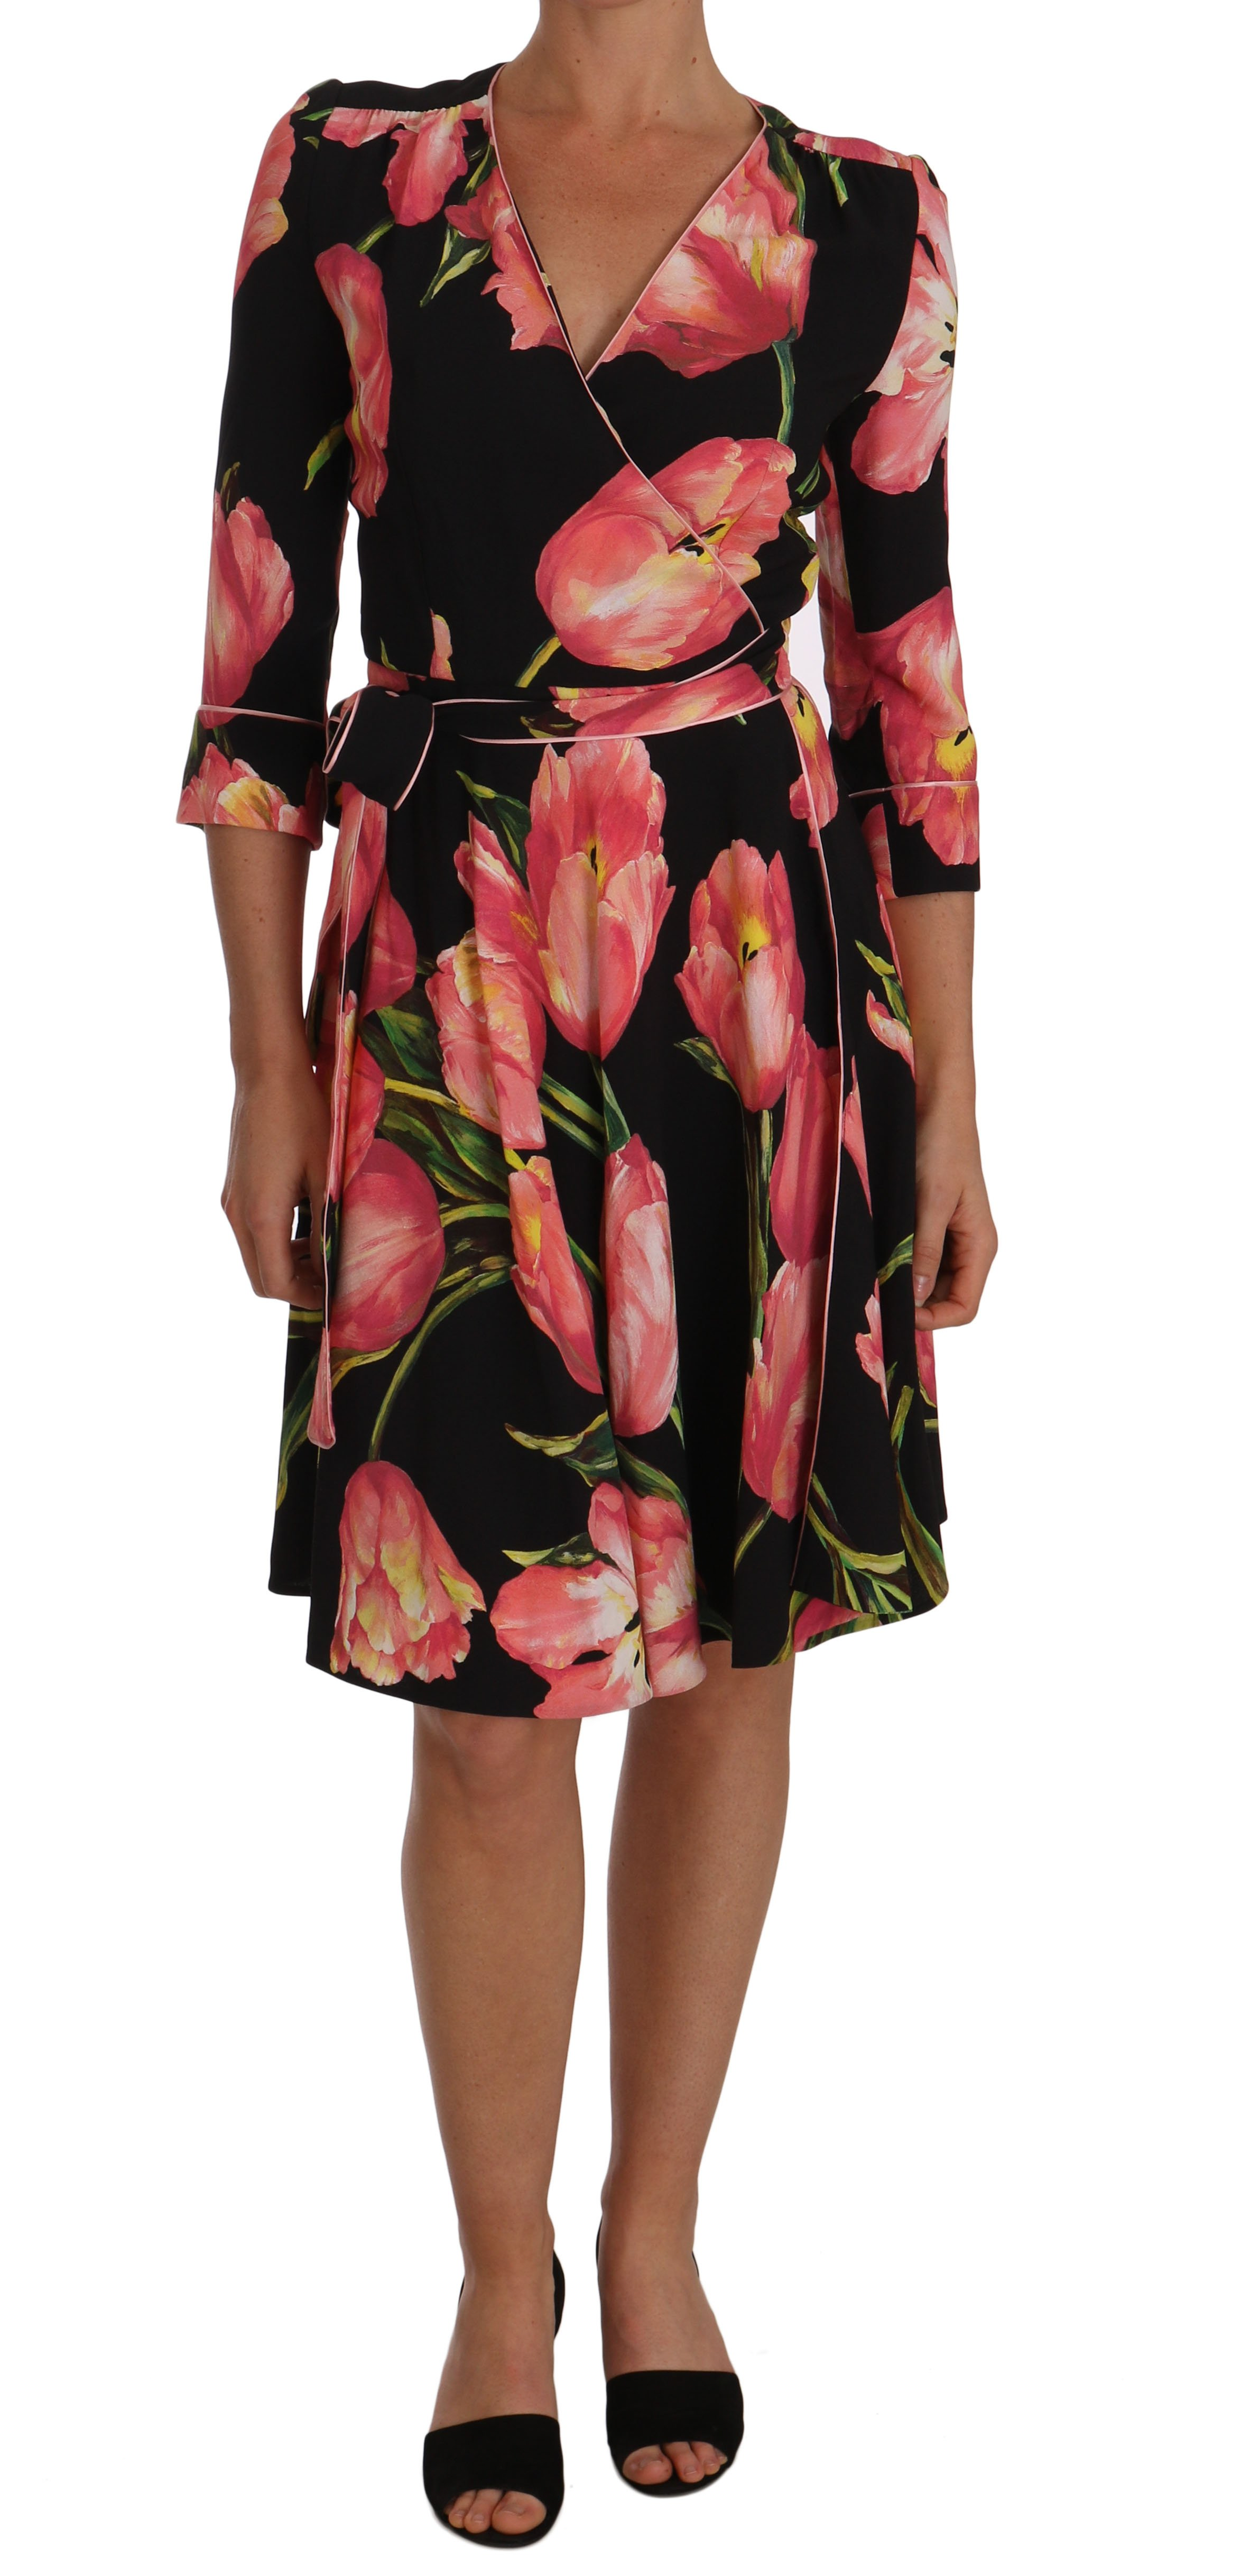 Dolce & Gabbana Women's Tulip Print Stretch Shift Dress Black DR1446 - IT38|XS